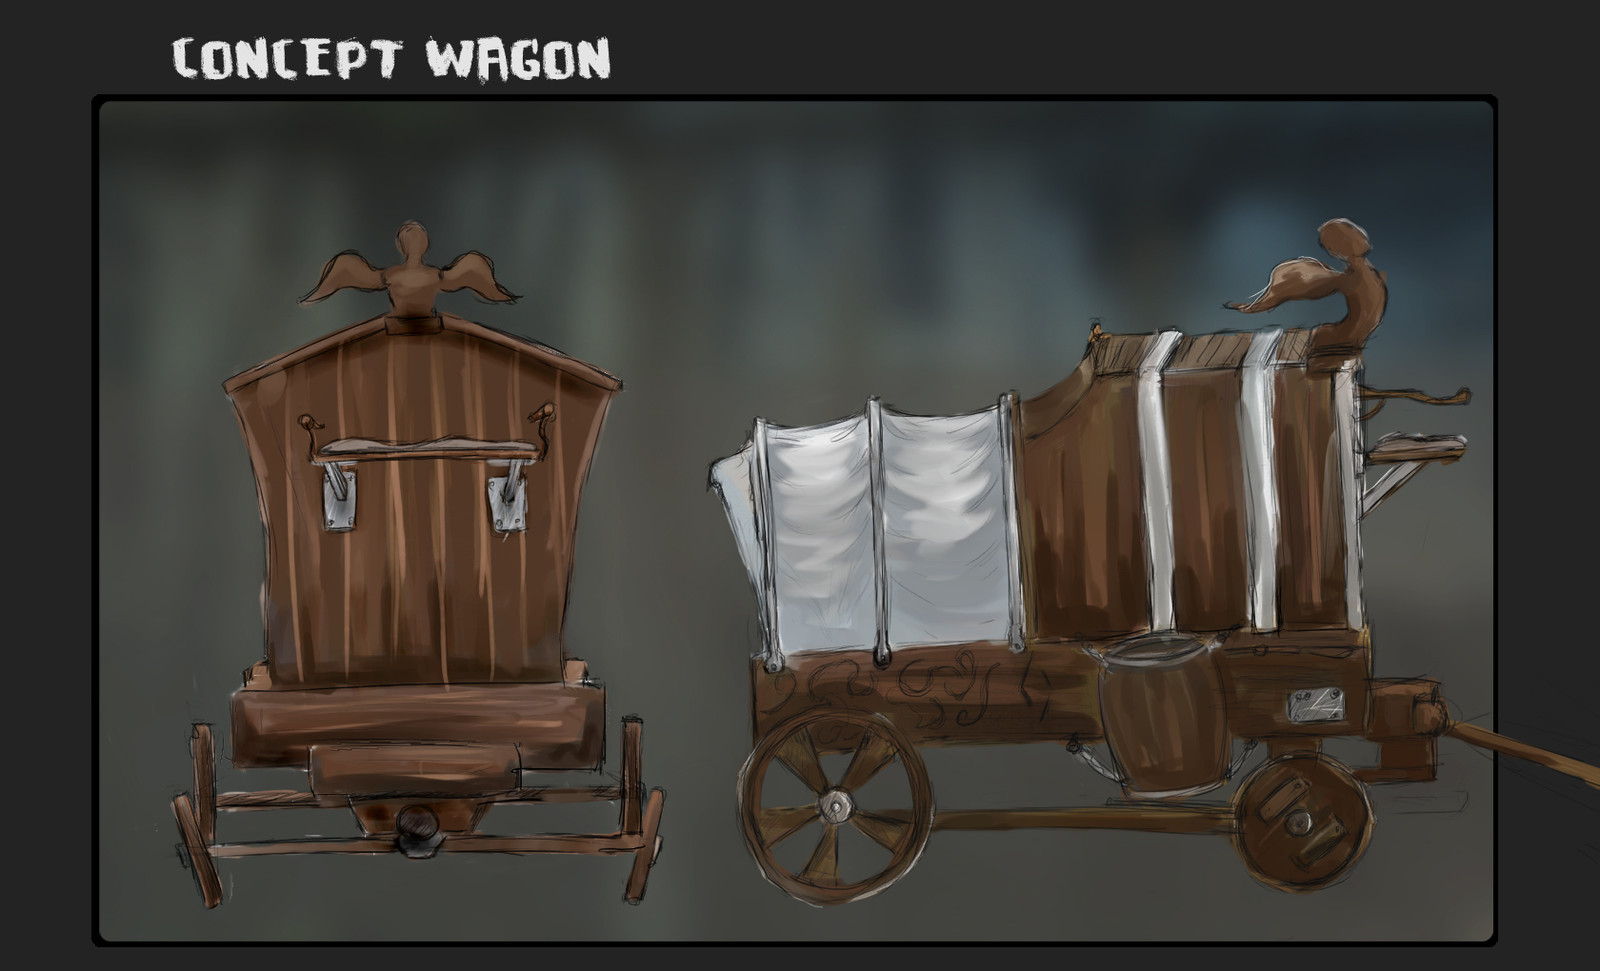 charette chariot sketch